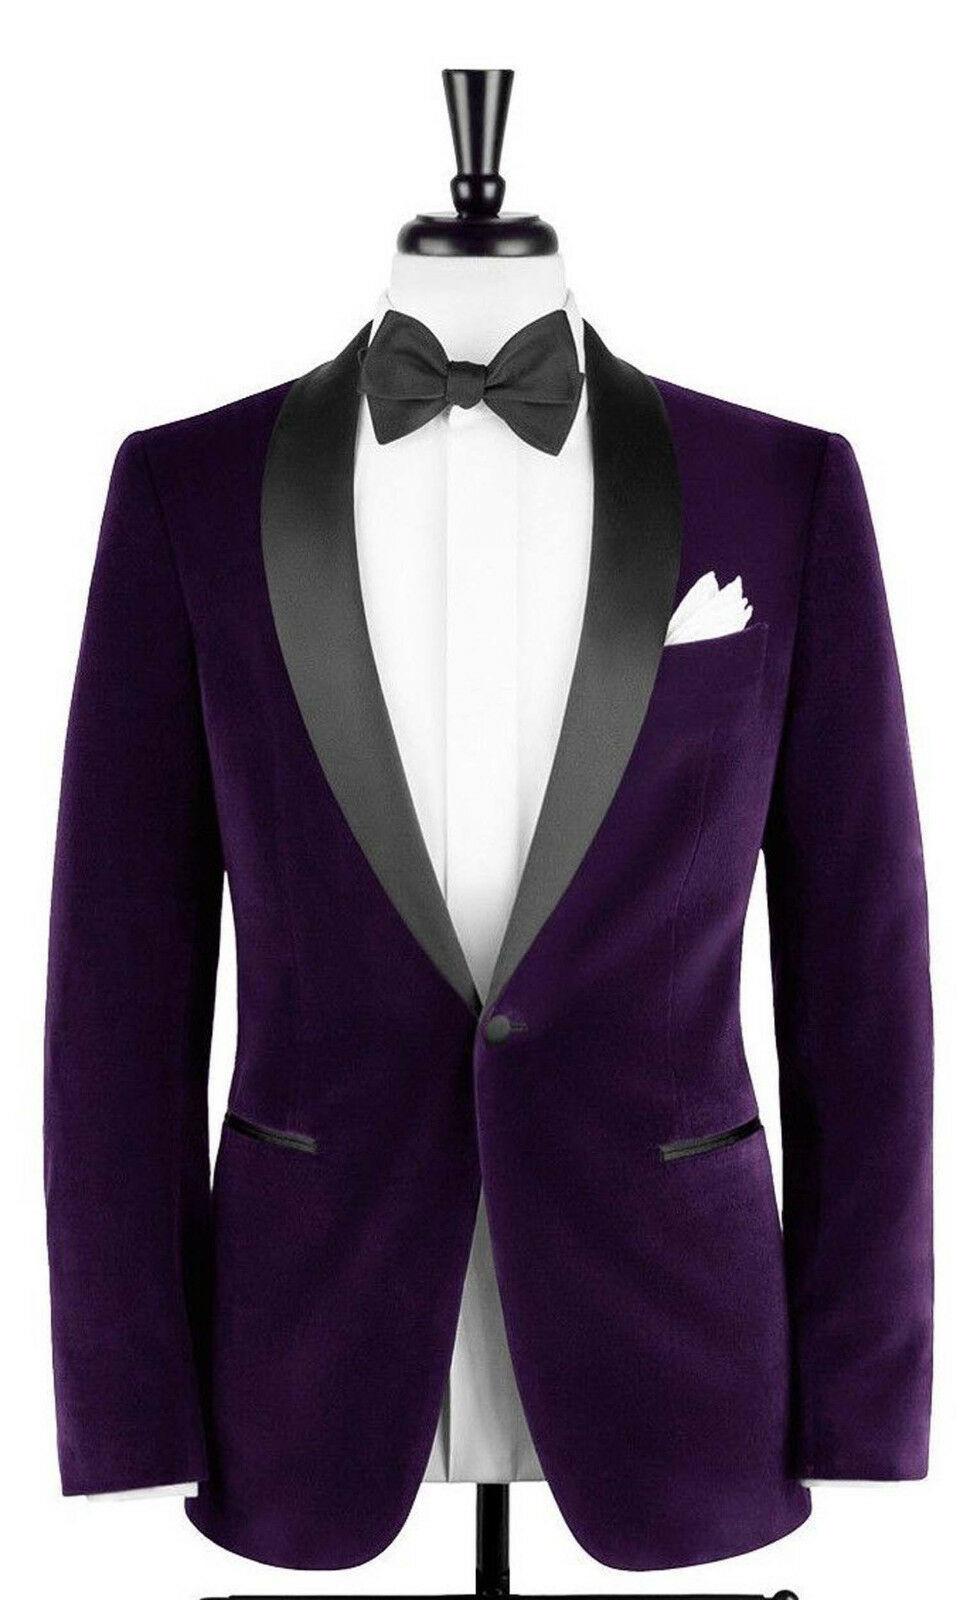 Men Purple Smoking Jackets Designer Elegant Luxury Tuxedo